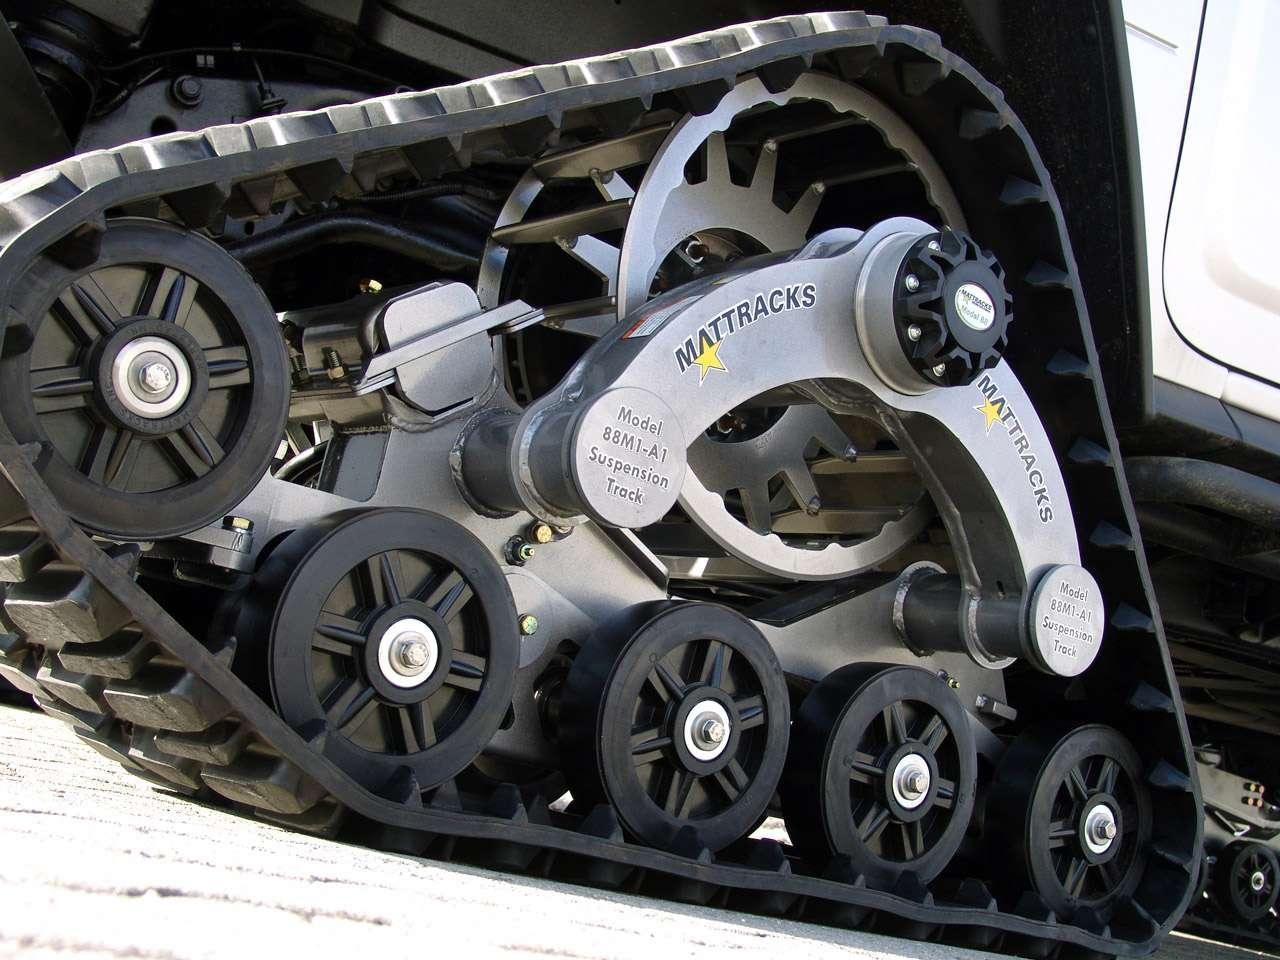 Hummer H2 Bomber GeigerCars marzec 2010